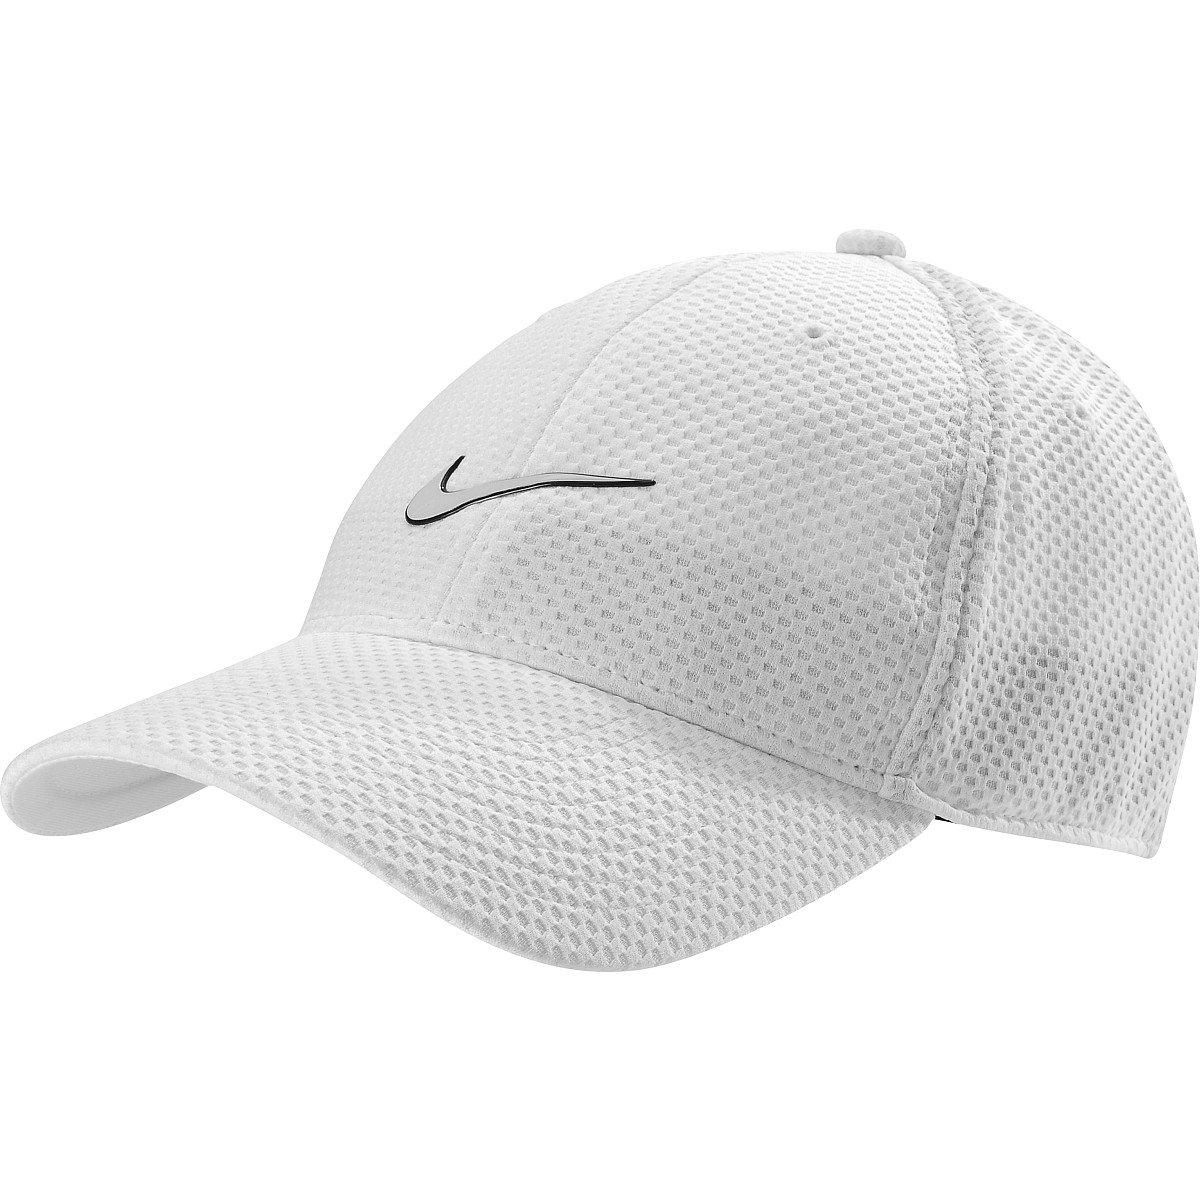 cbe19ee65 Mens Nike Heritage Dri-Fit Mesh Adjustable Hat White/Black 480387 ...